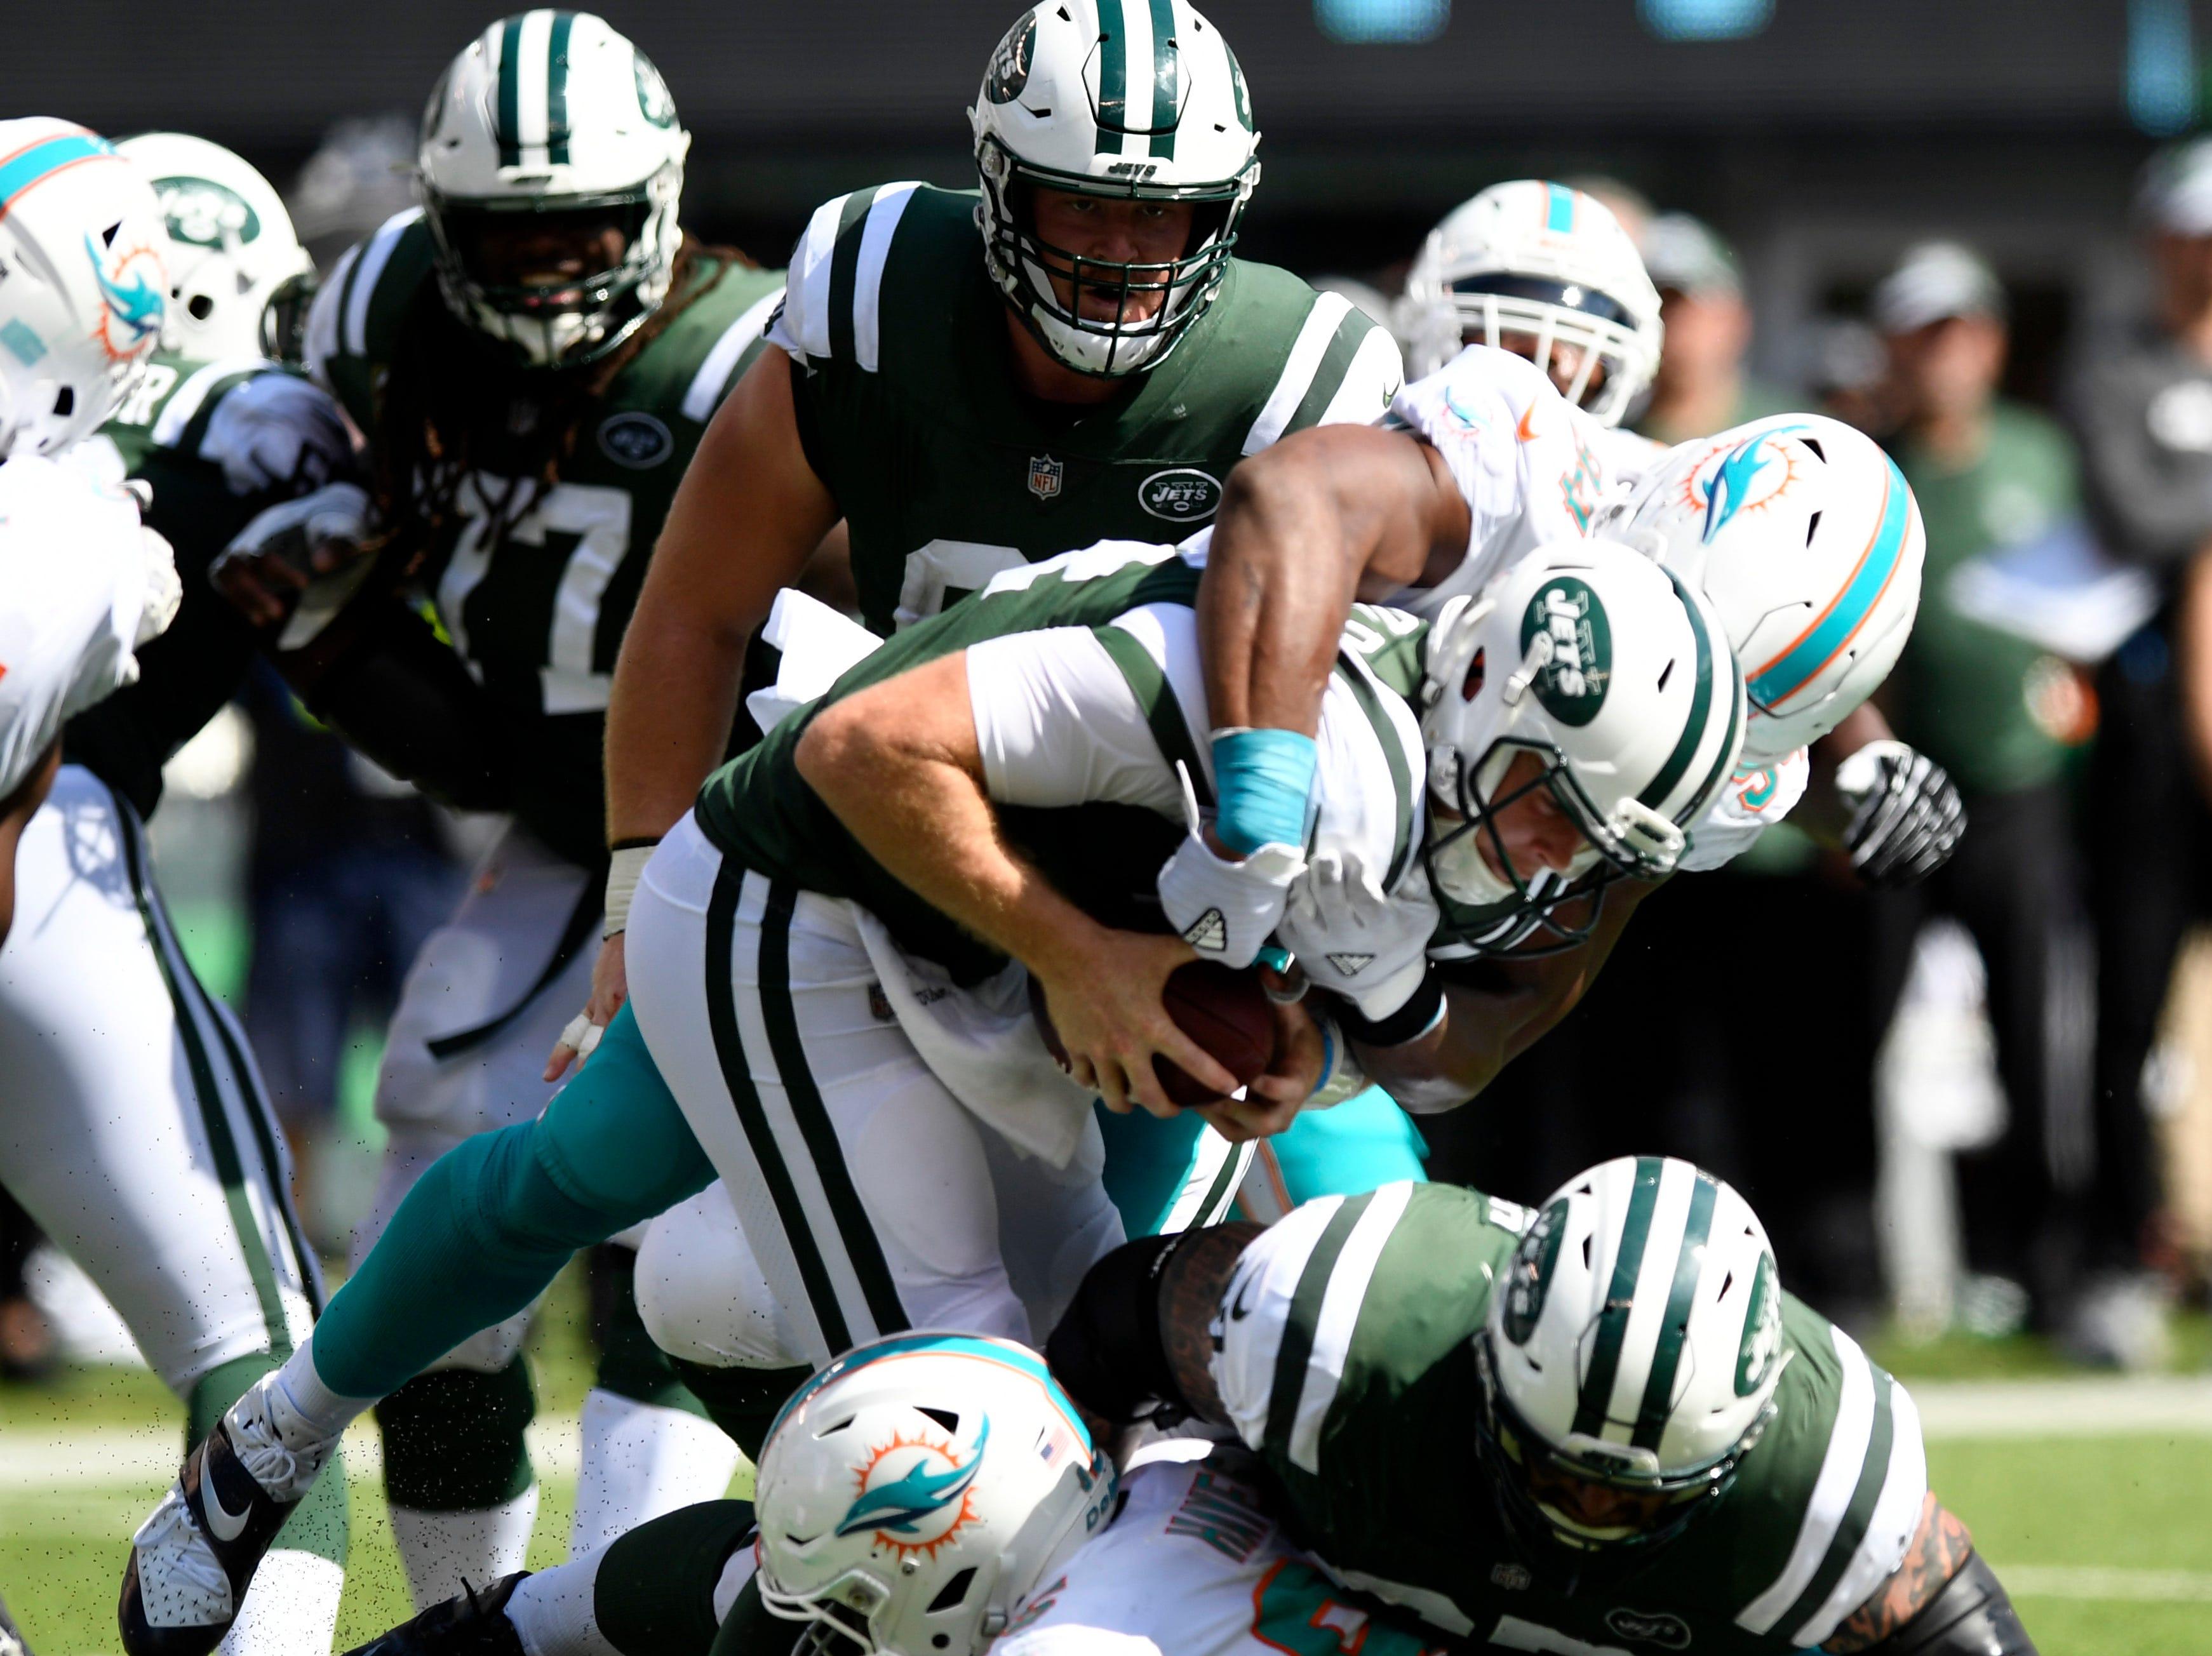 Miami Dolphins defensive end Robert Quinn (94) sacks New York Jets quarterback Sam Darnold (14) in Week 2 at MetLife Stadium in East Rutherford, NJ on Sunday, September 16, 2018.